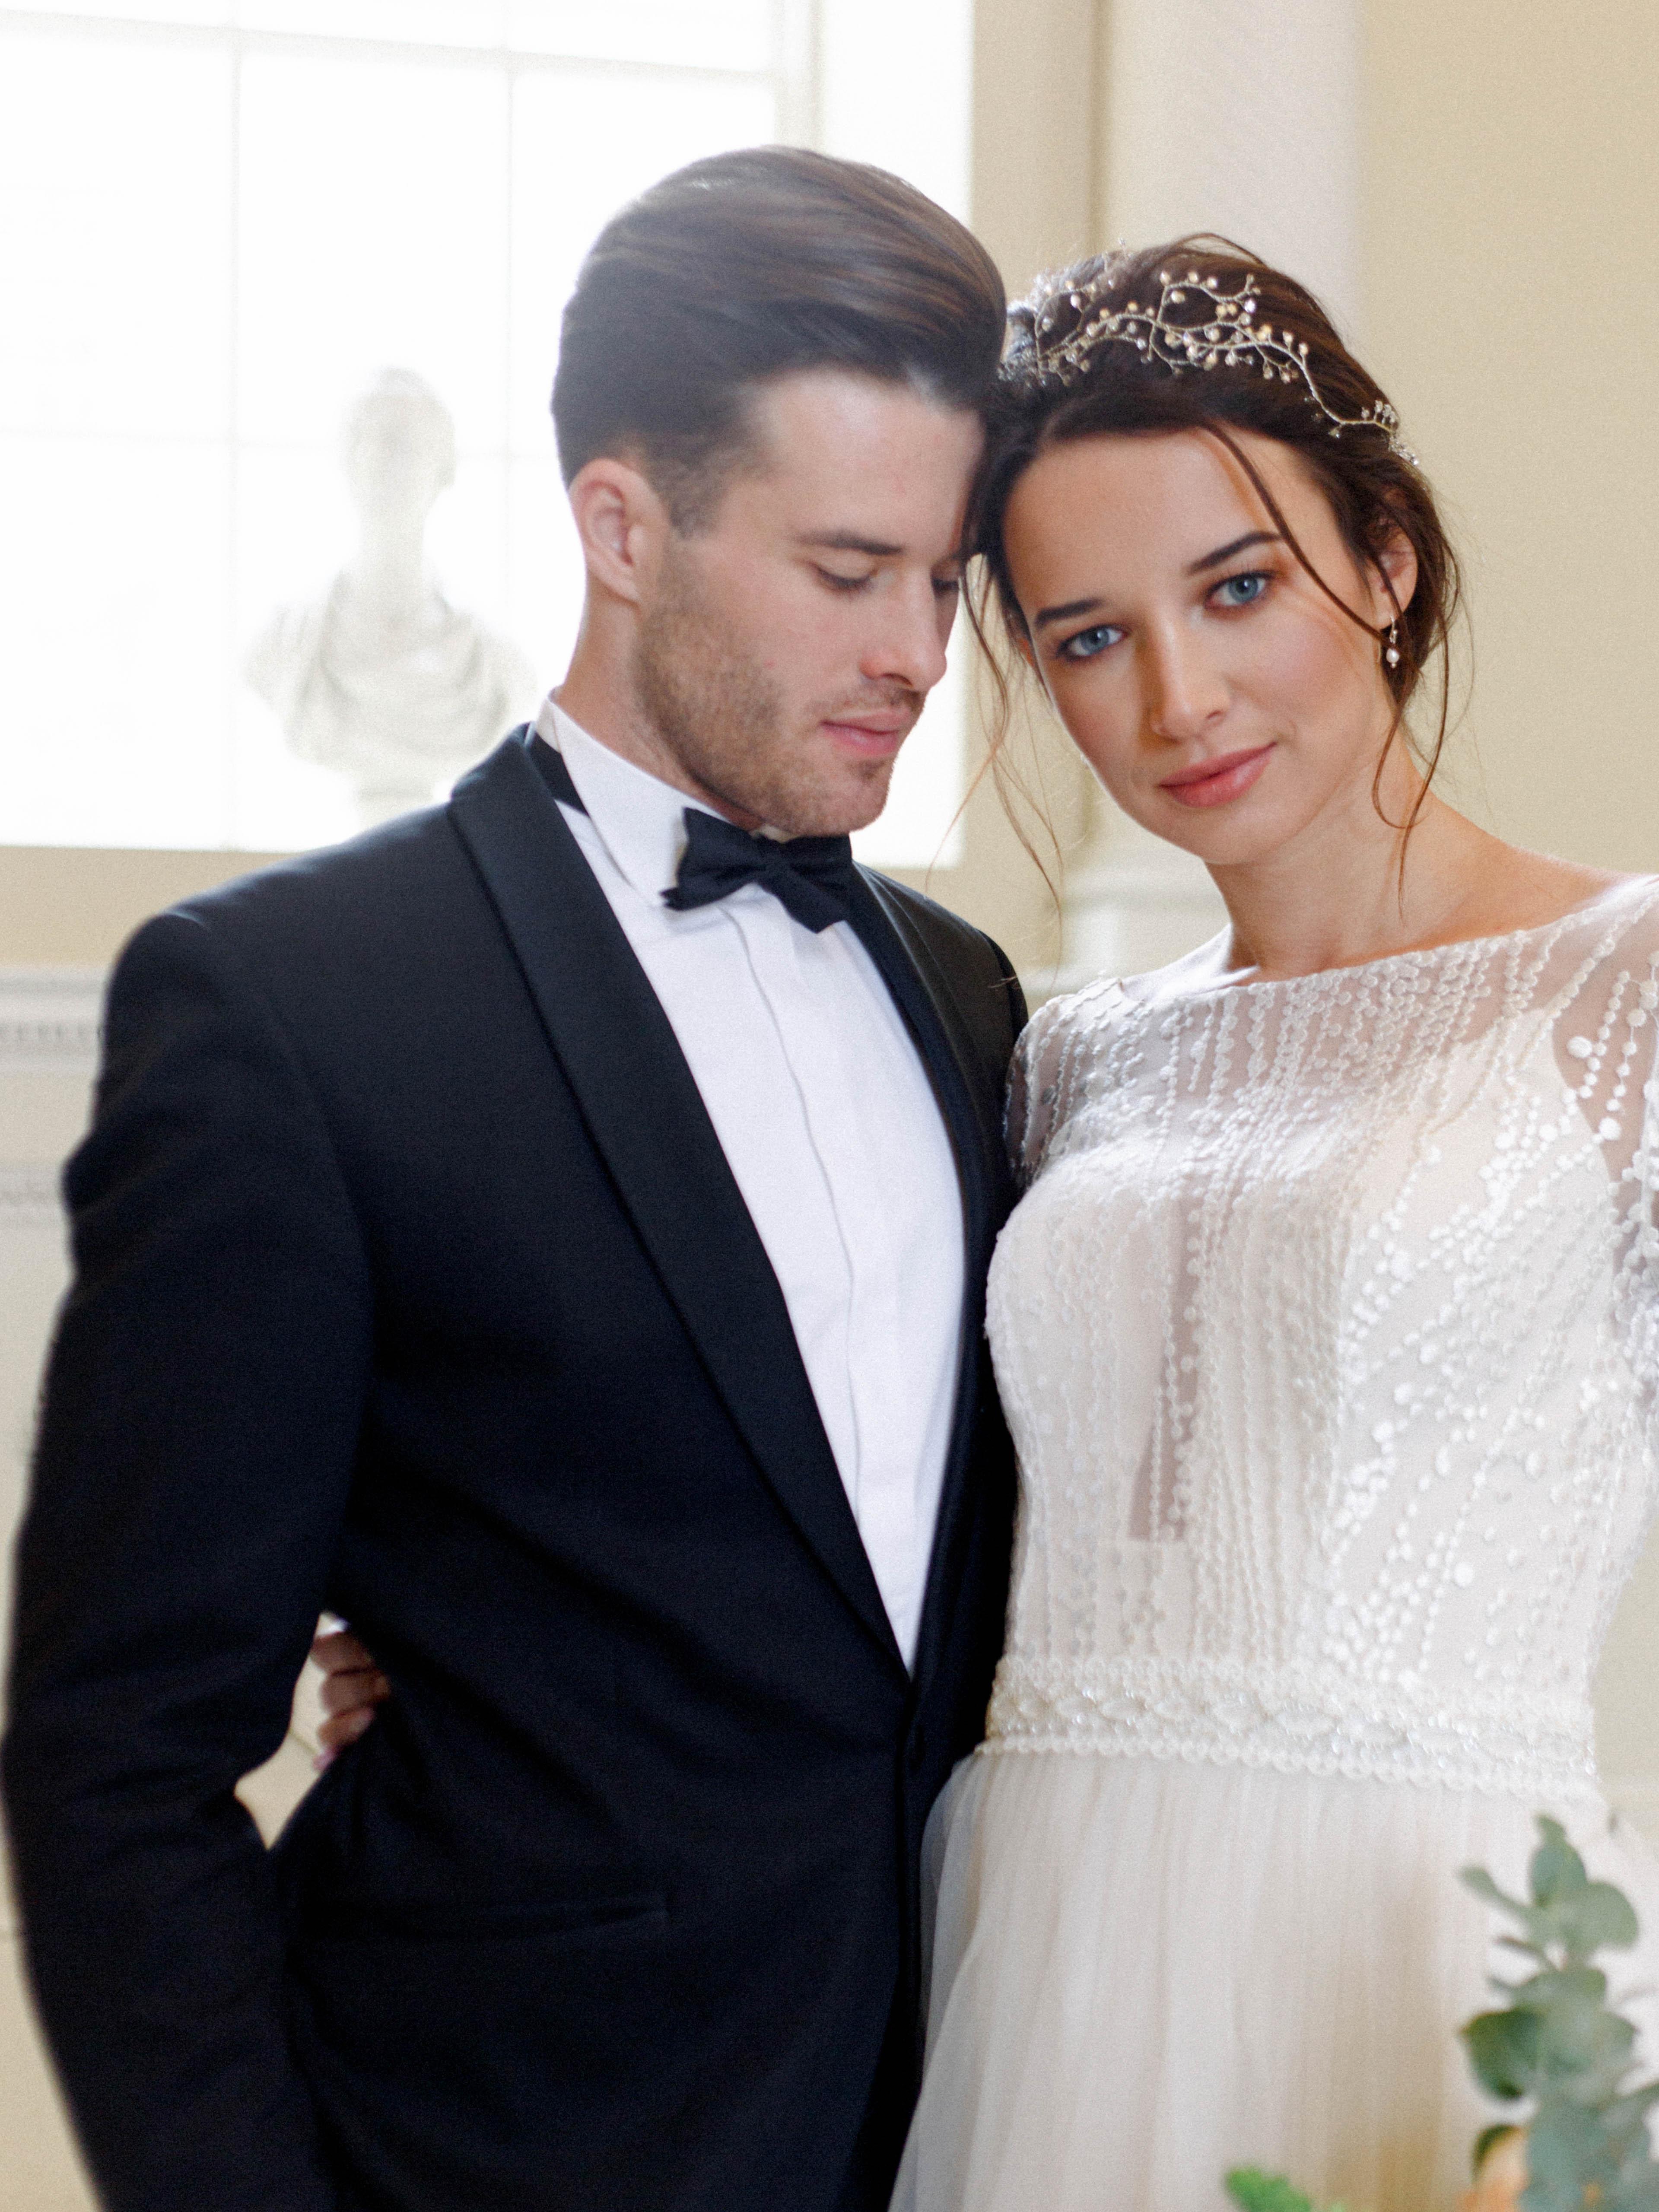 gorgeous-modern-bride-and-groom-in-Italian-style-wedding-venue-London